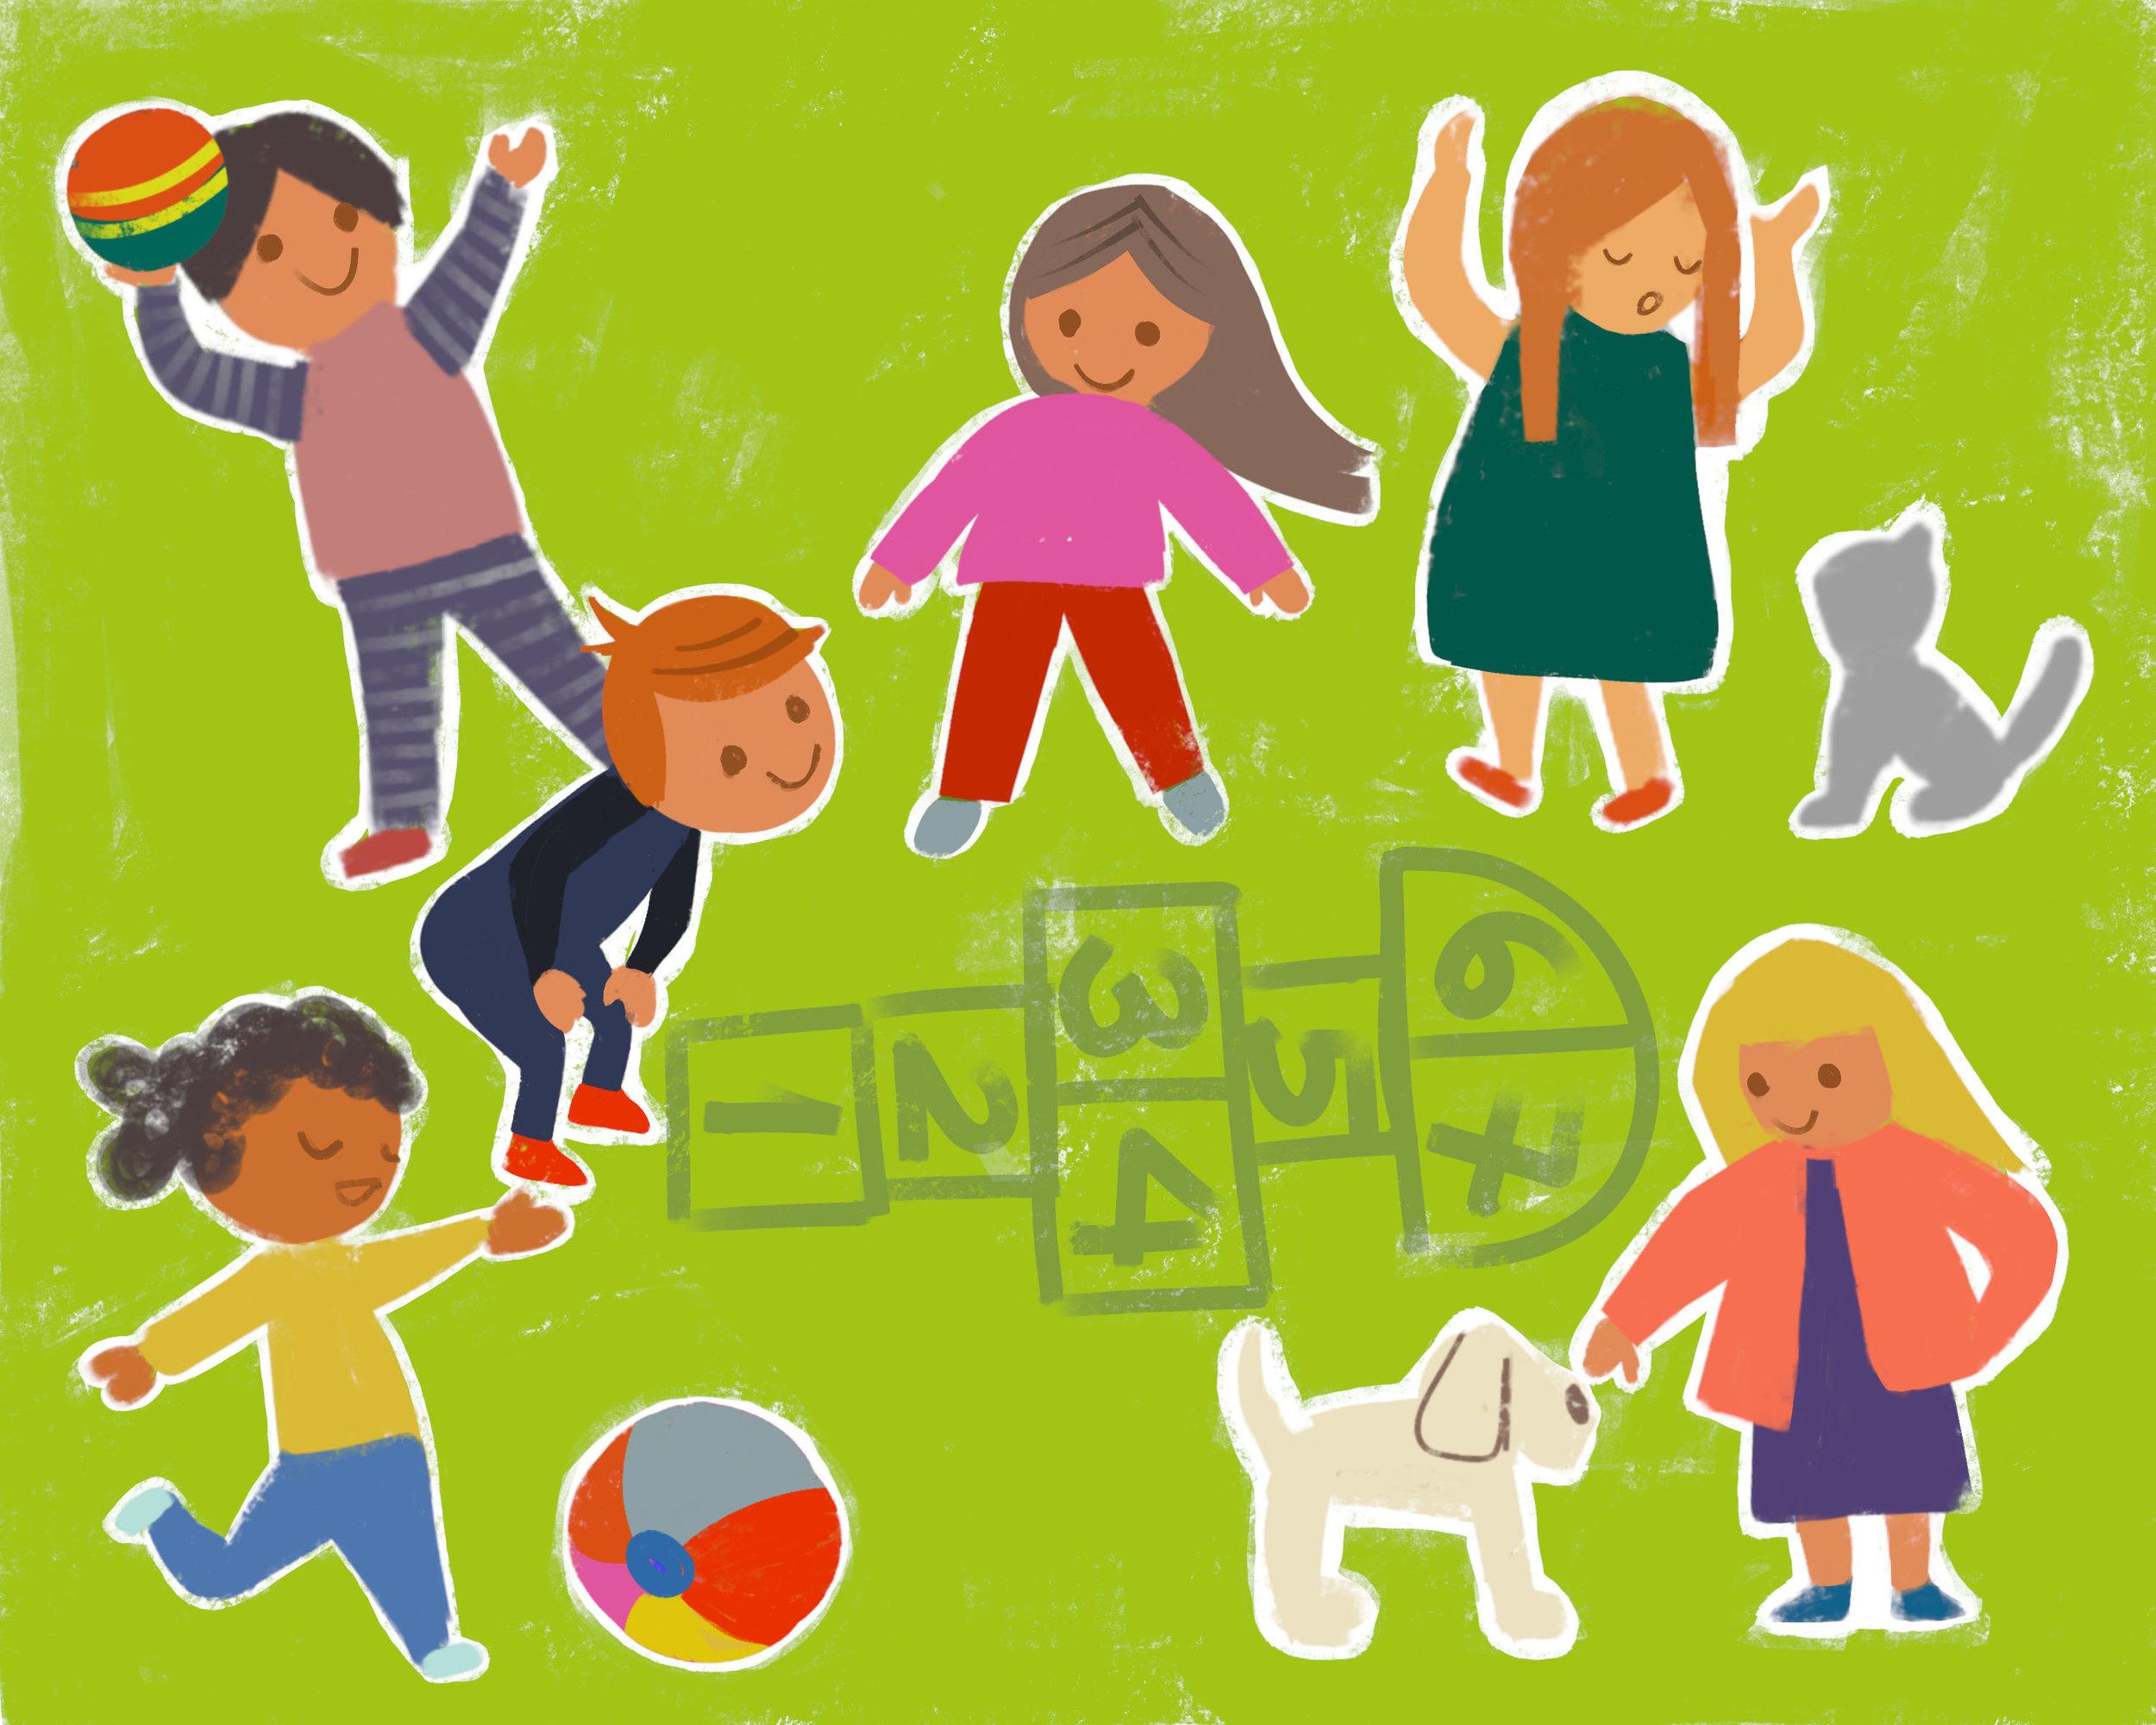 KidsatPlay-green-folio.jpg